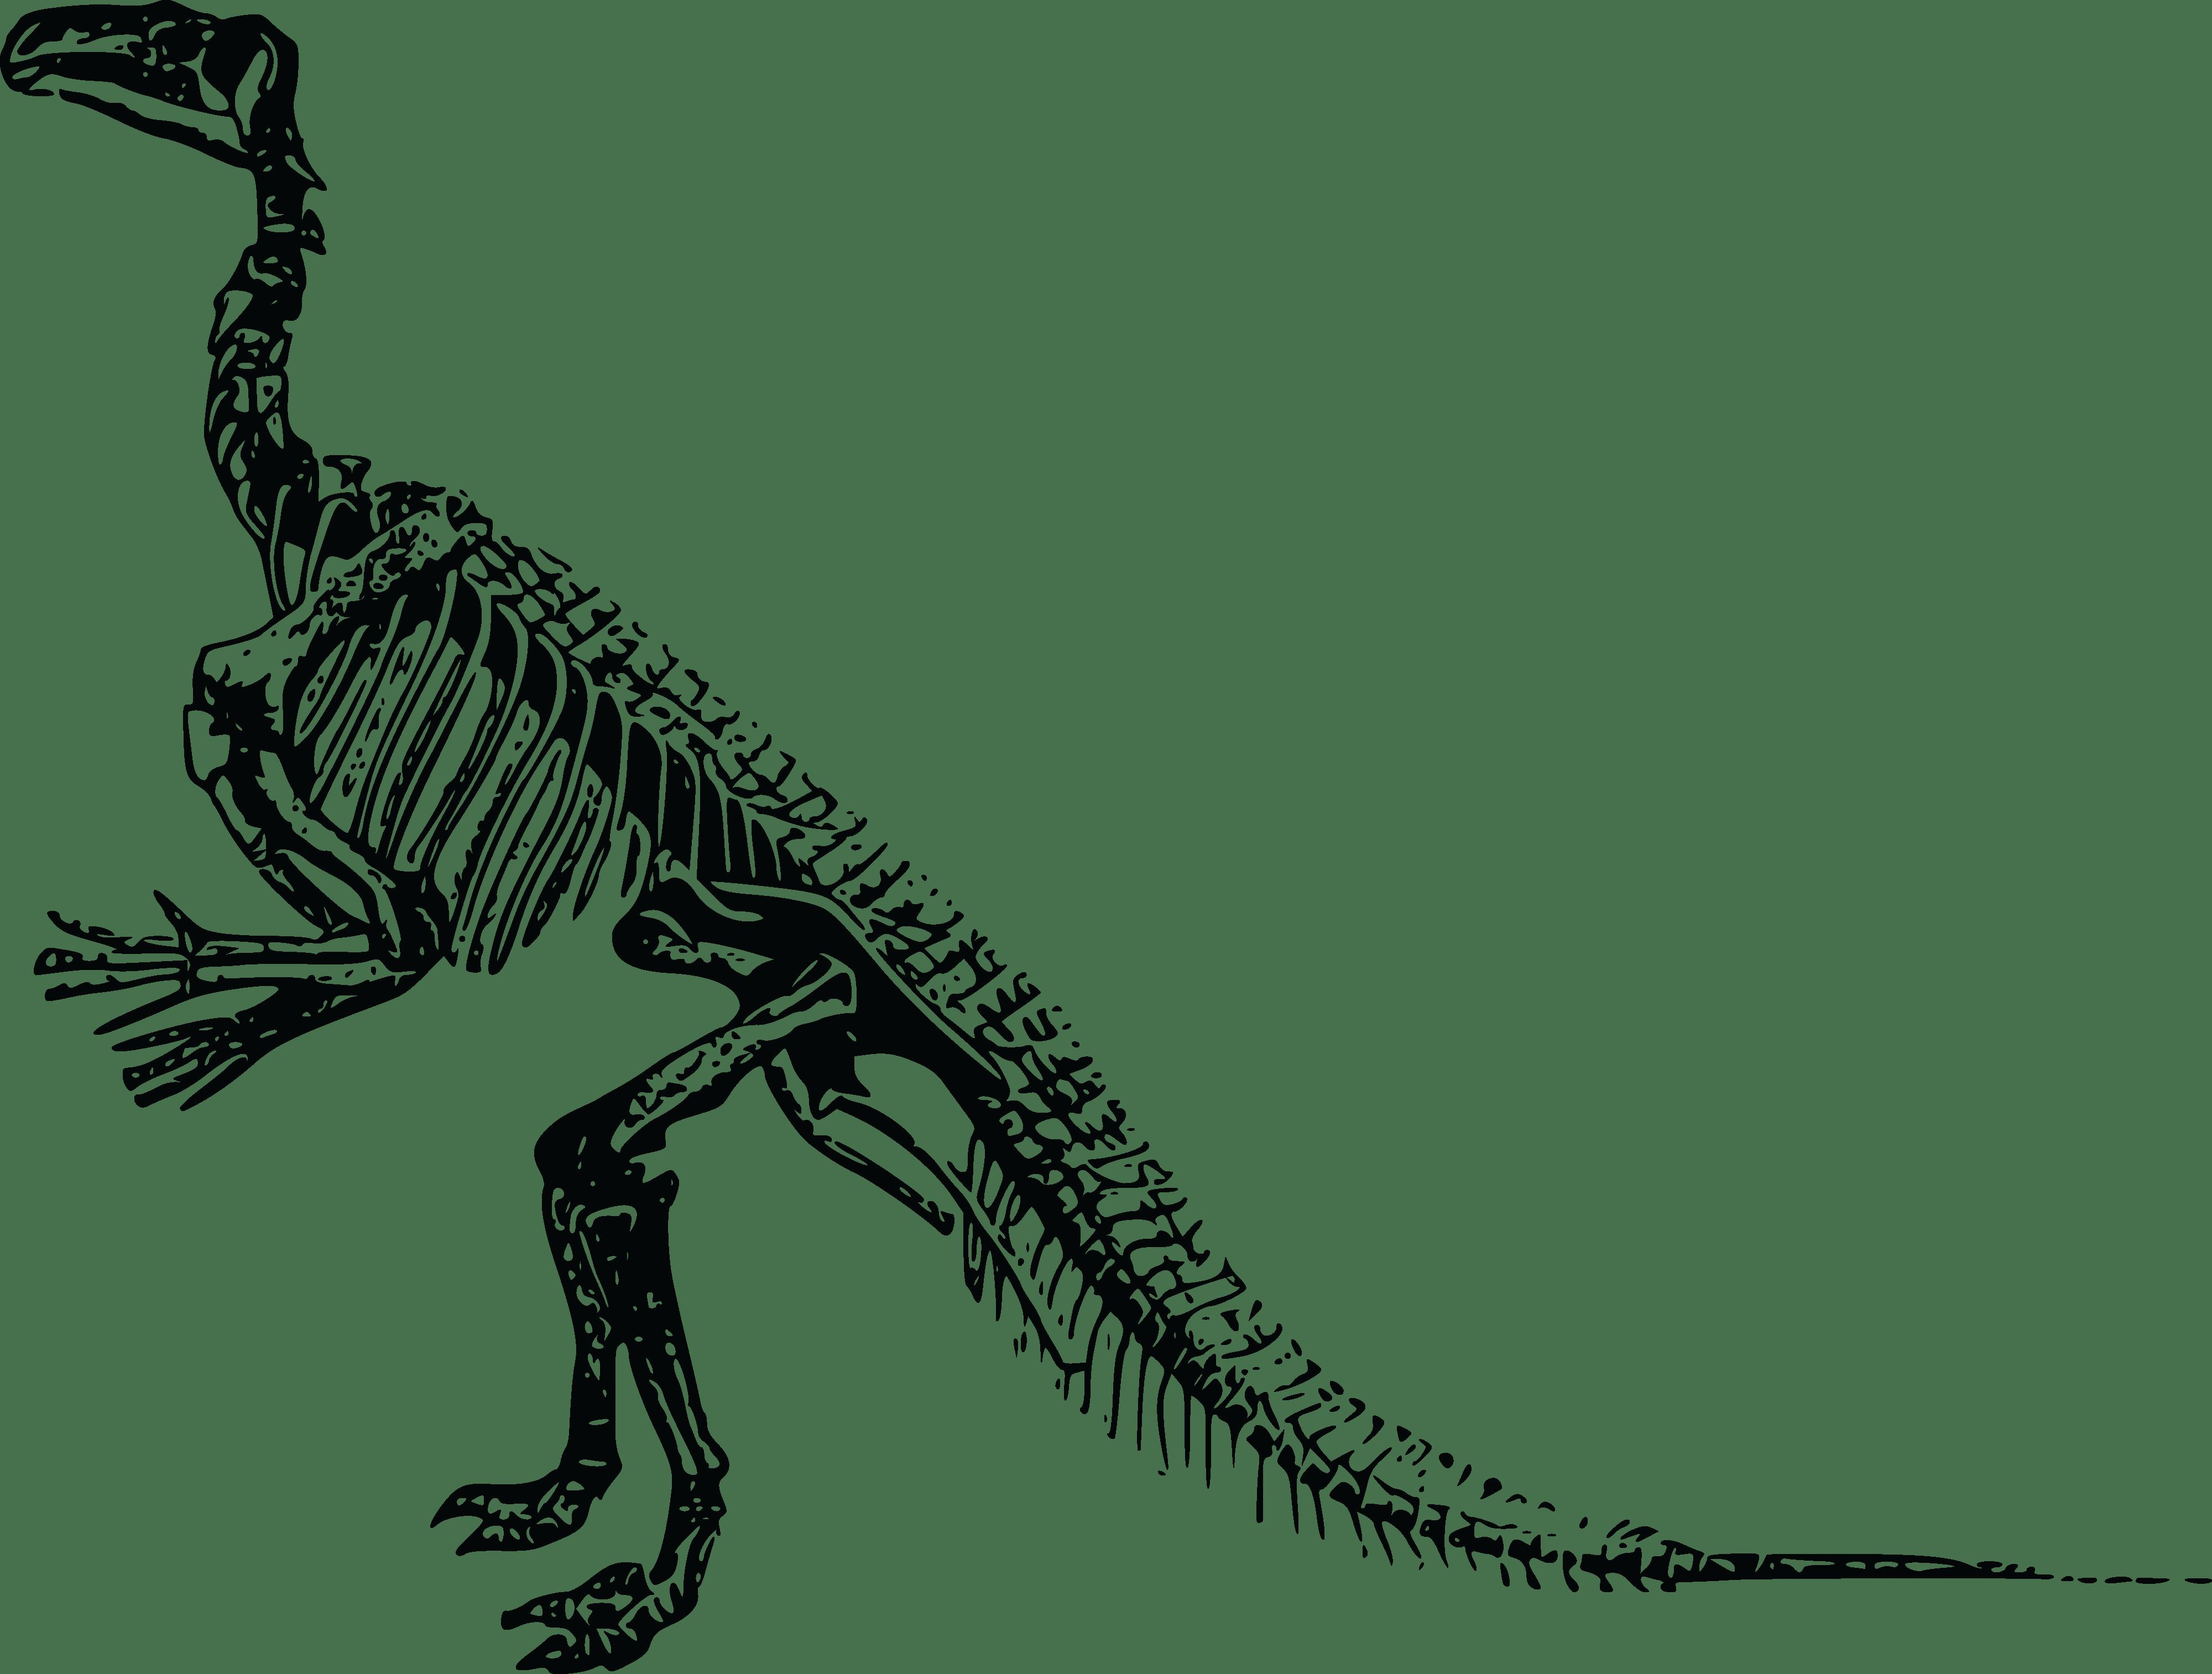 Free Clipart Of A Dinosaur Skeleton